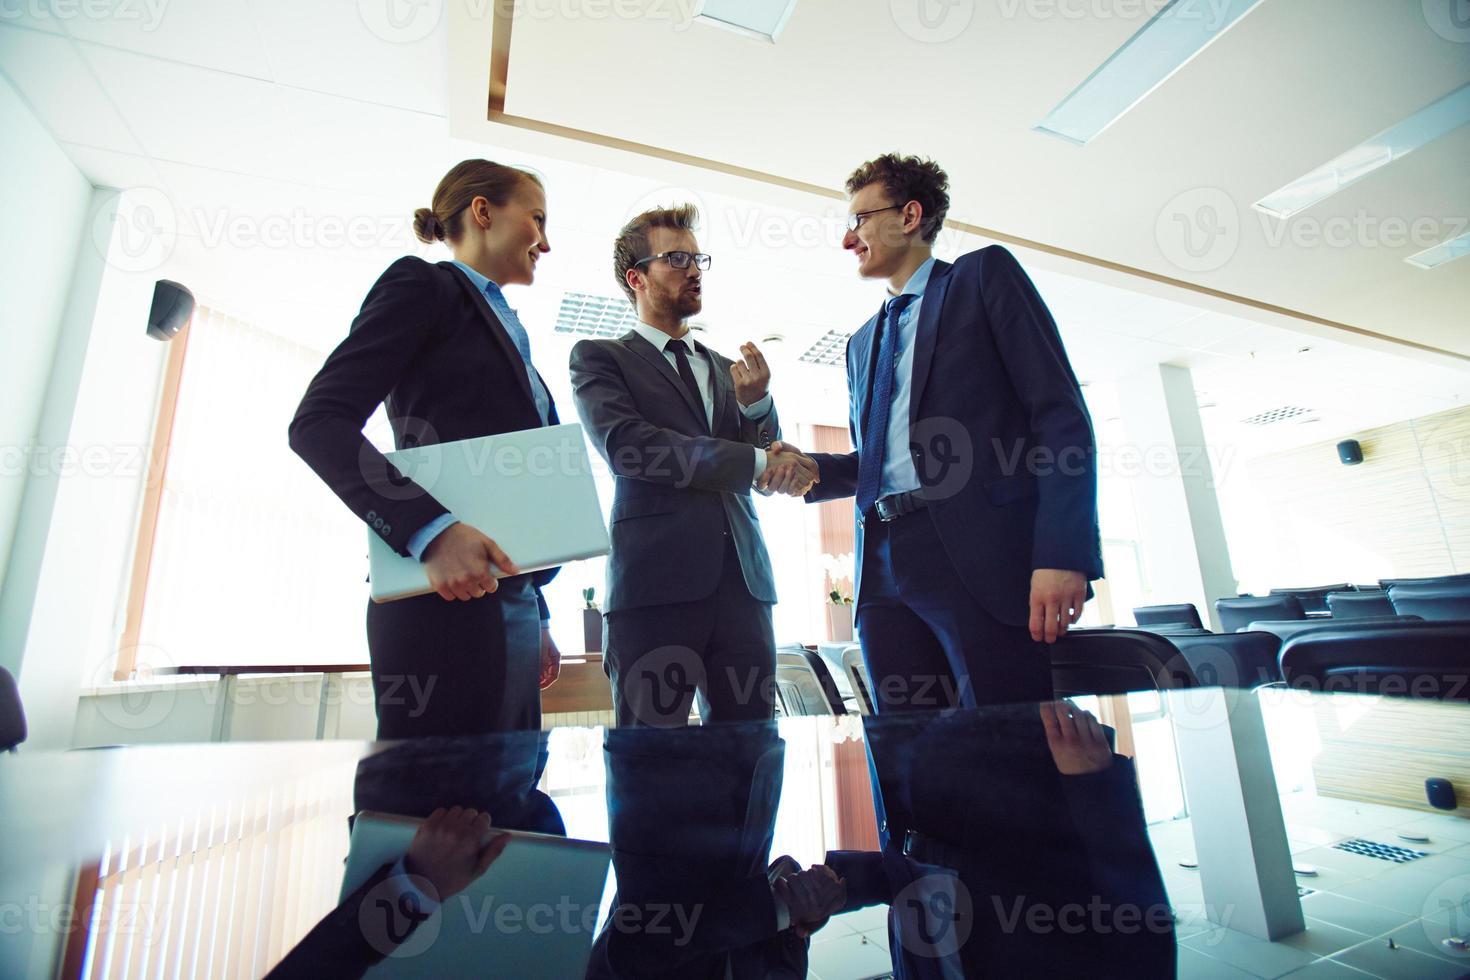 réunion au bureau photo